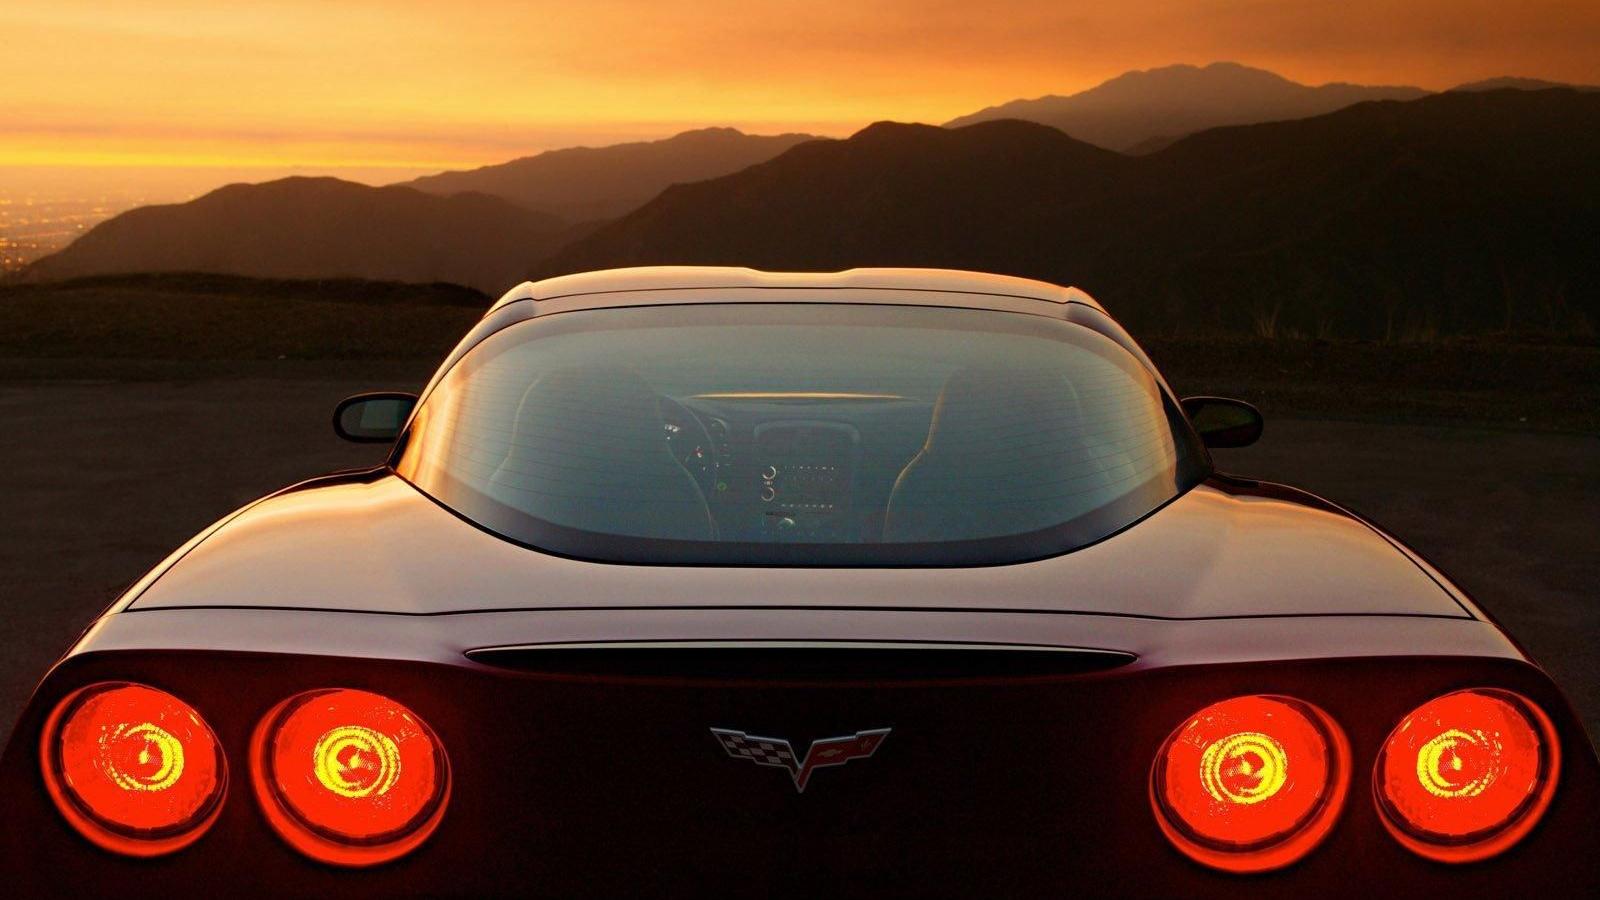 Free Download Por Do Sol No Corvette 4k Hd Wallpaper 1600x1200